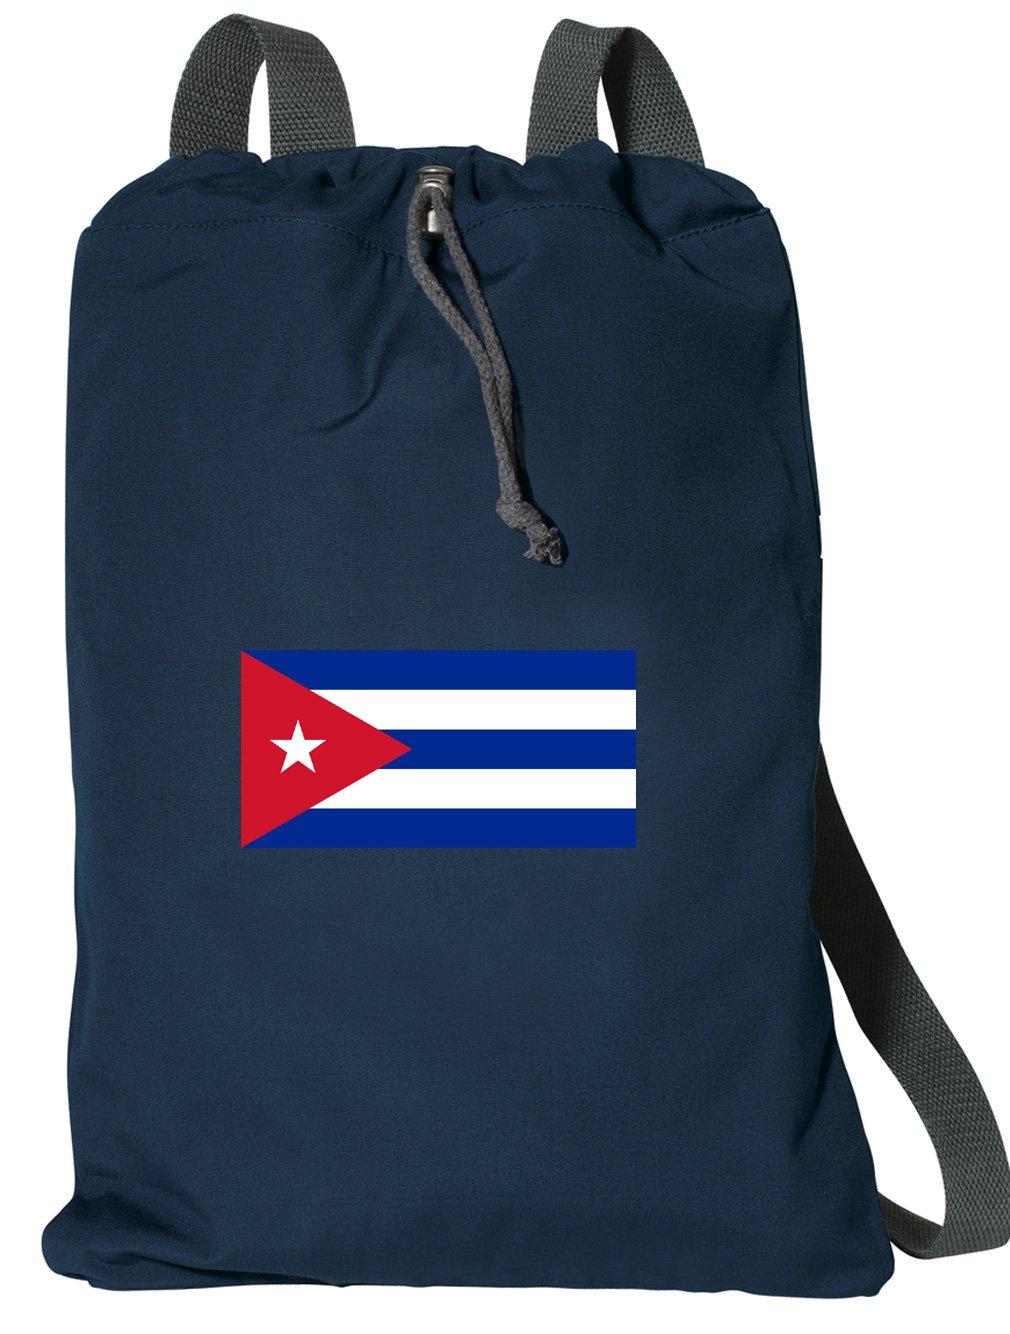 Cuba Drawstring Backpack RICH COTTON Cuban Flag Cinch Bag